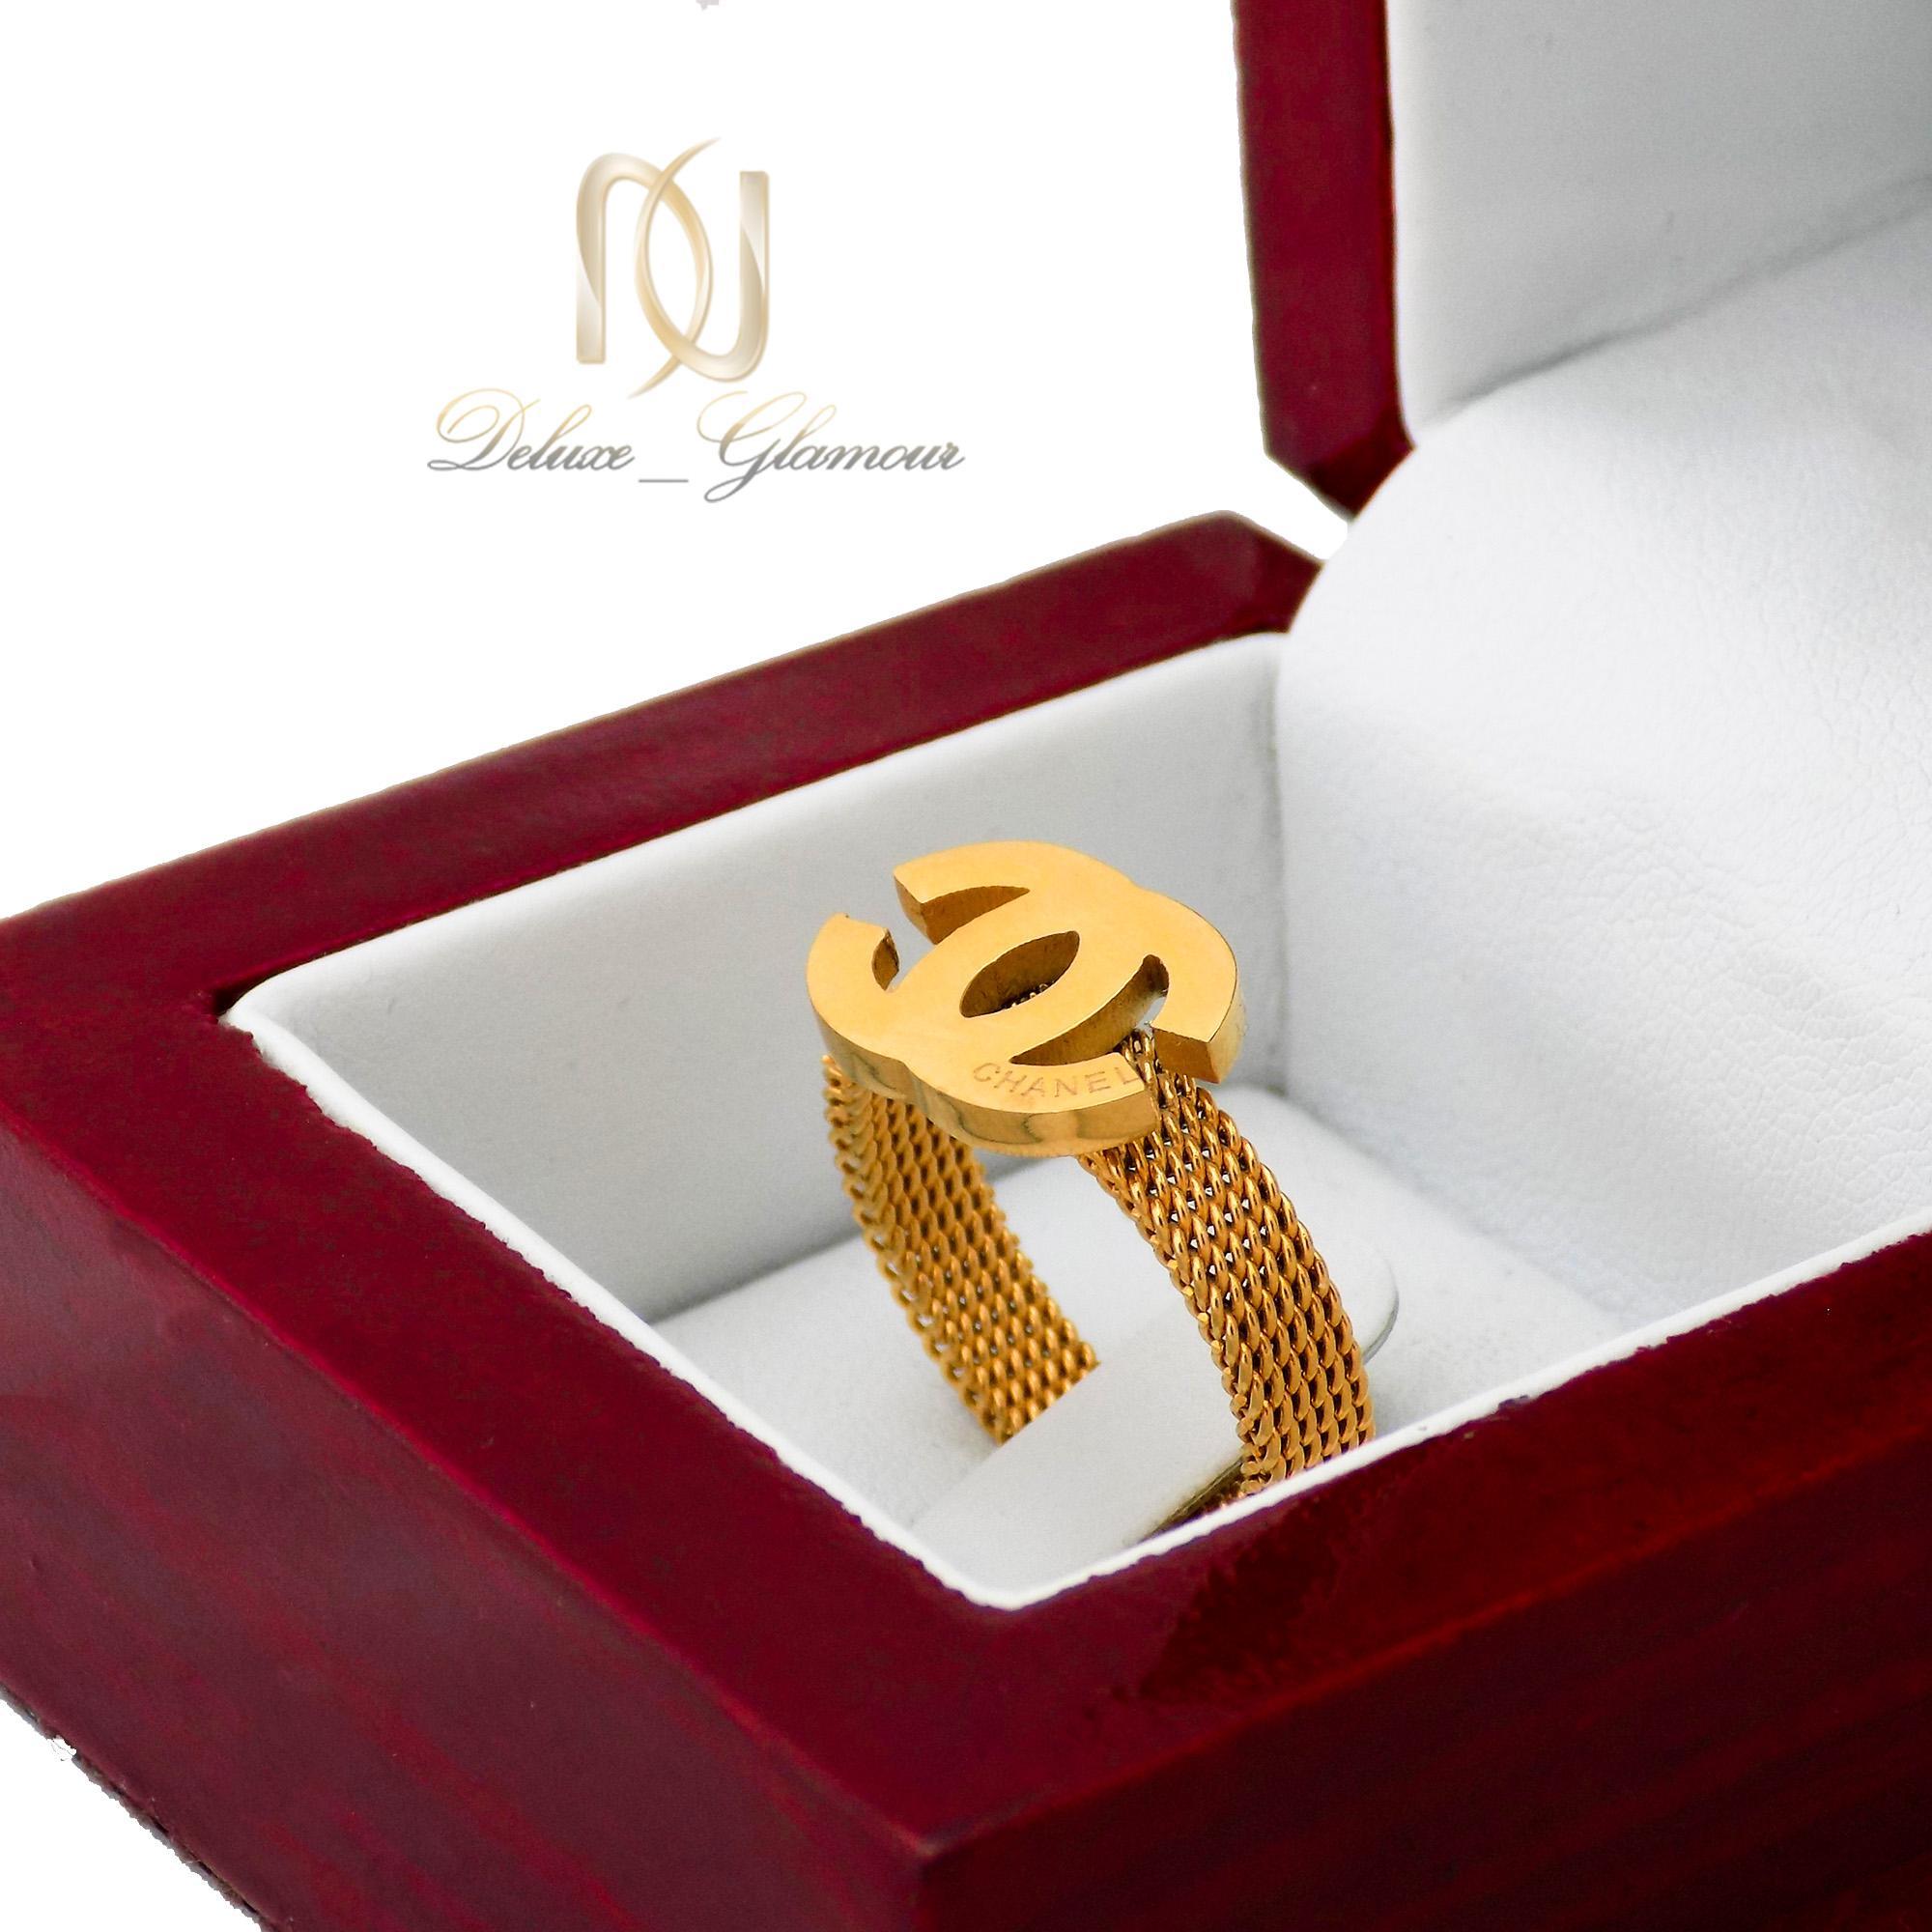 انگشتر زنانه استیل طرح چنل طلایی rg-n350